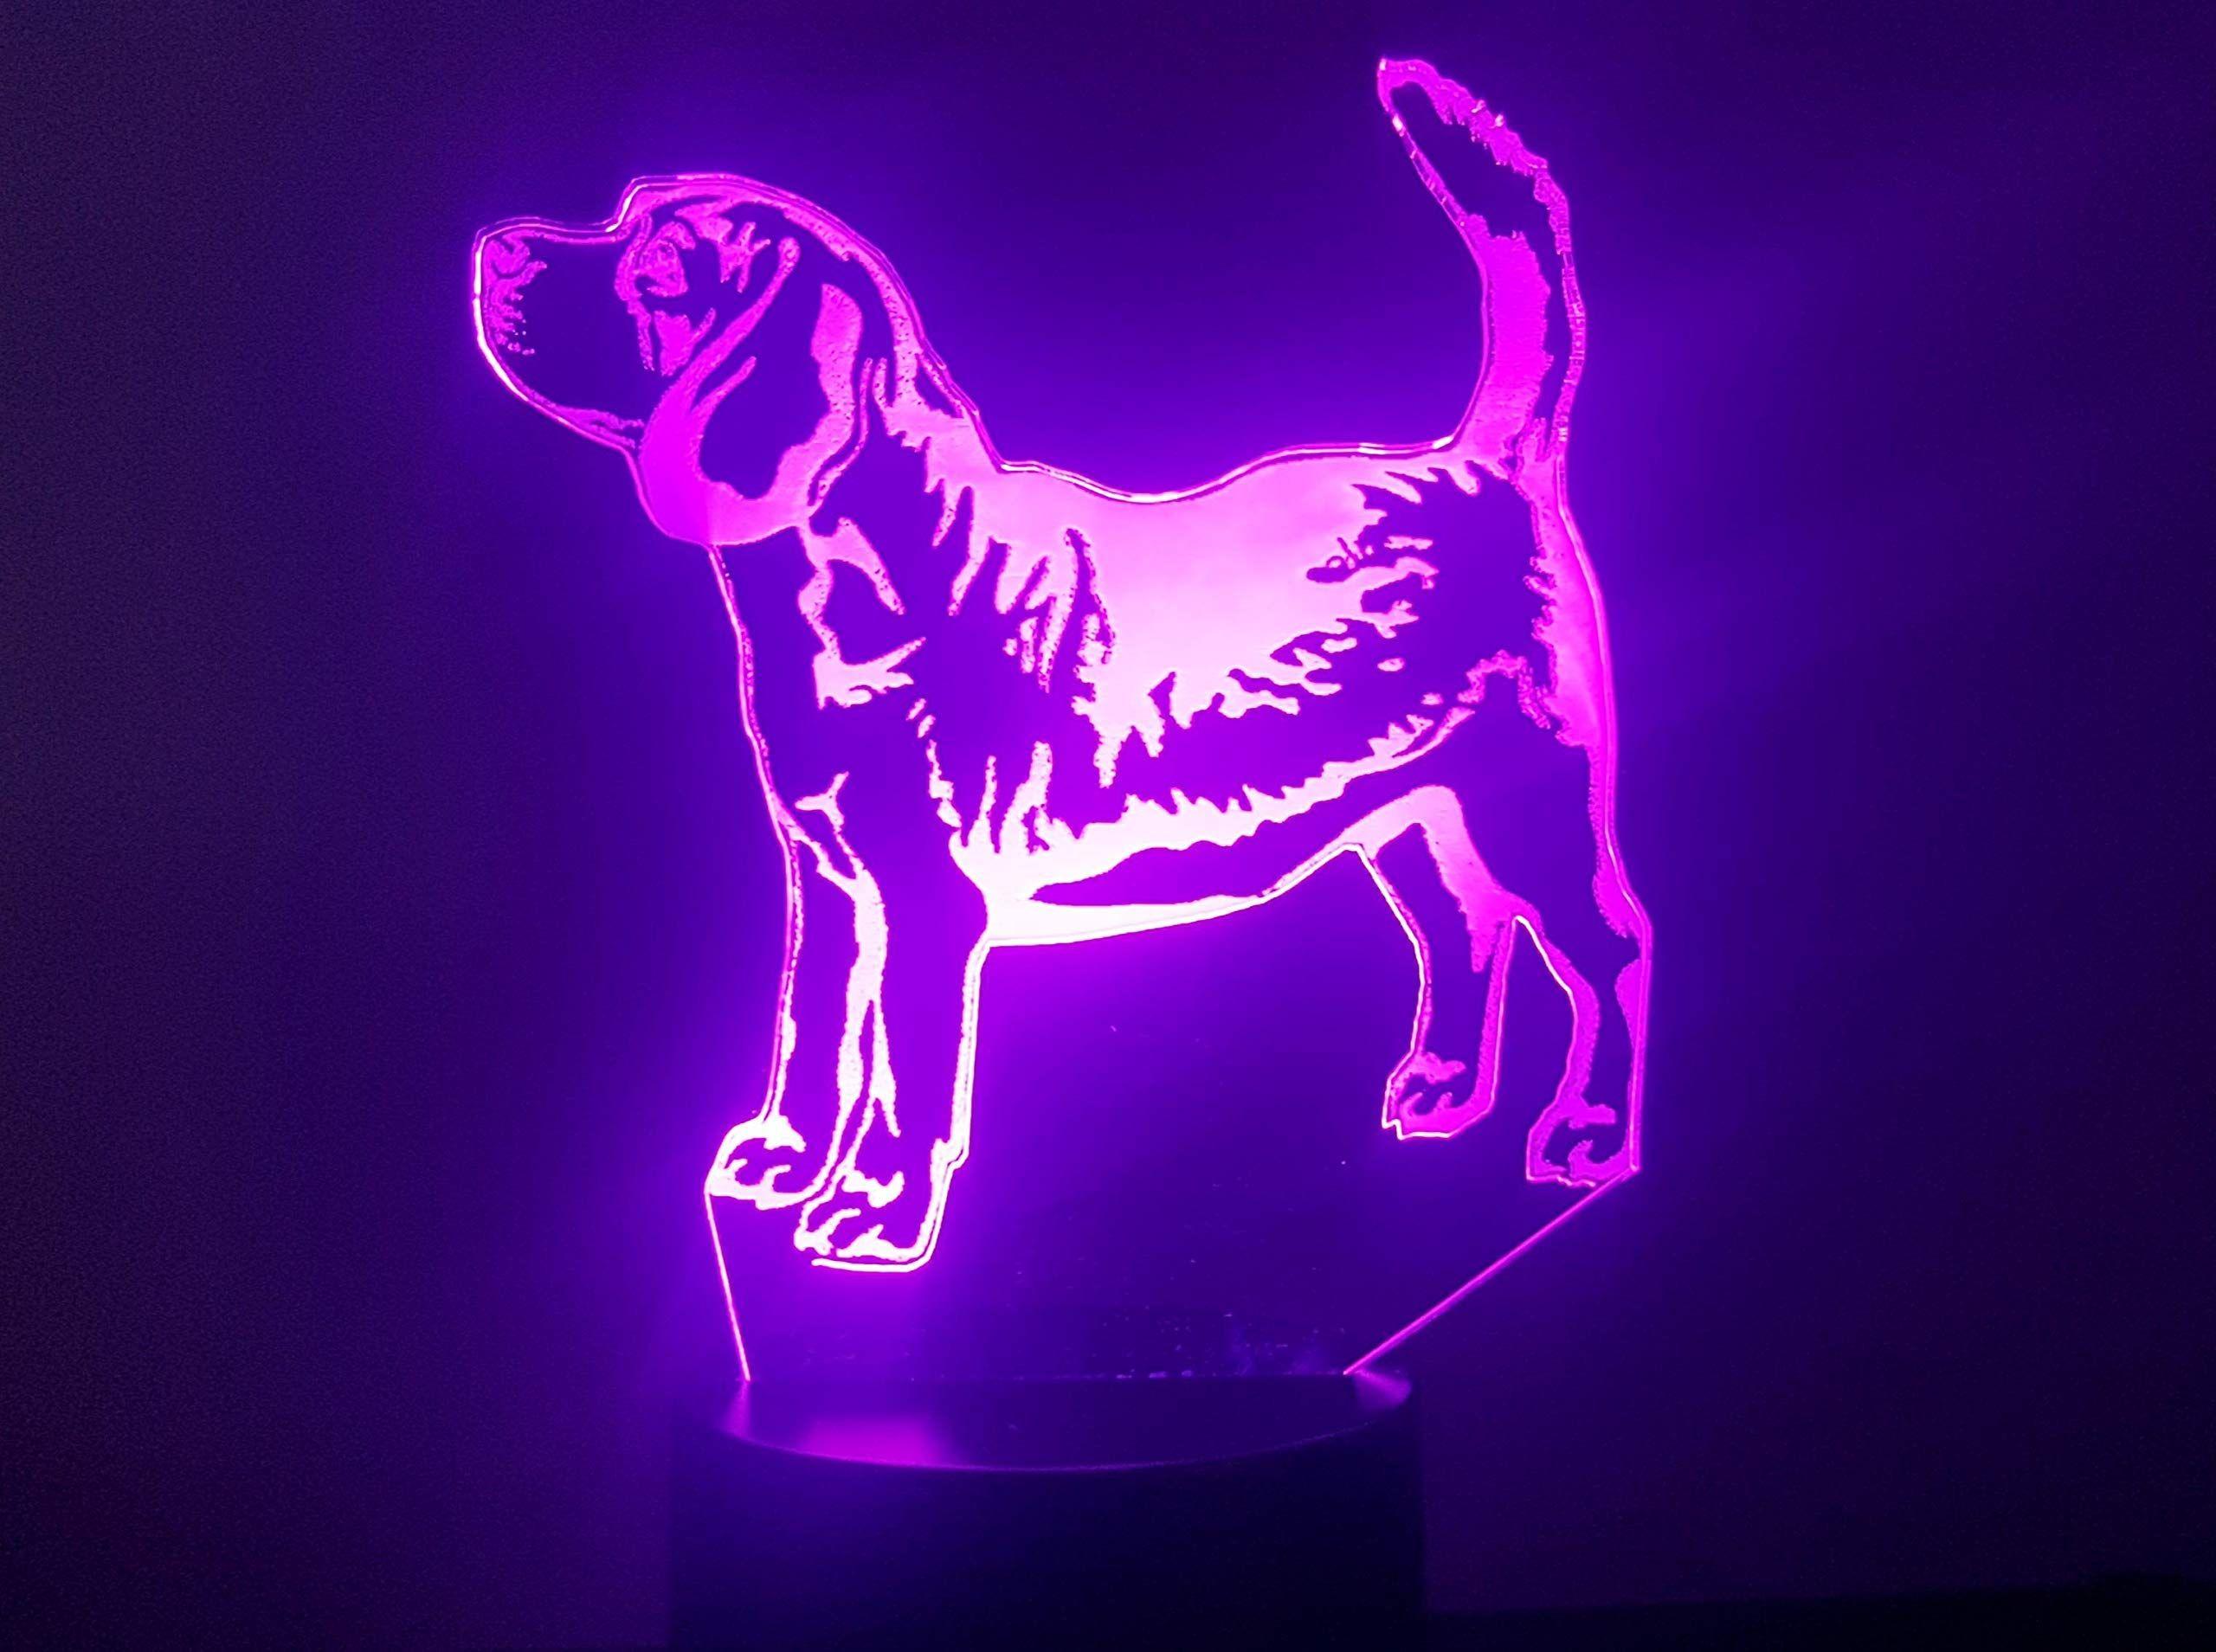 Beagle Hund 3d Lampe Led Hund Beagle Led Lampe Beagle Neon Signs Neon